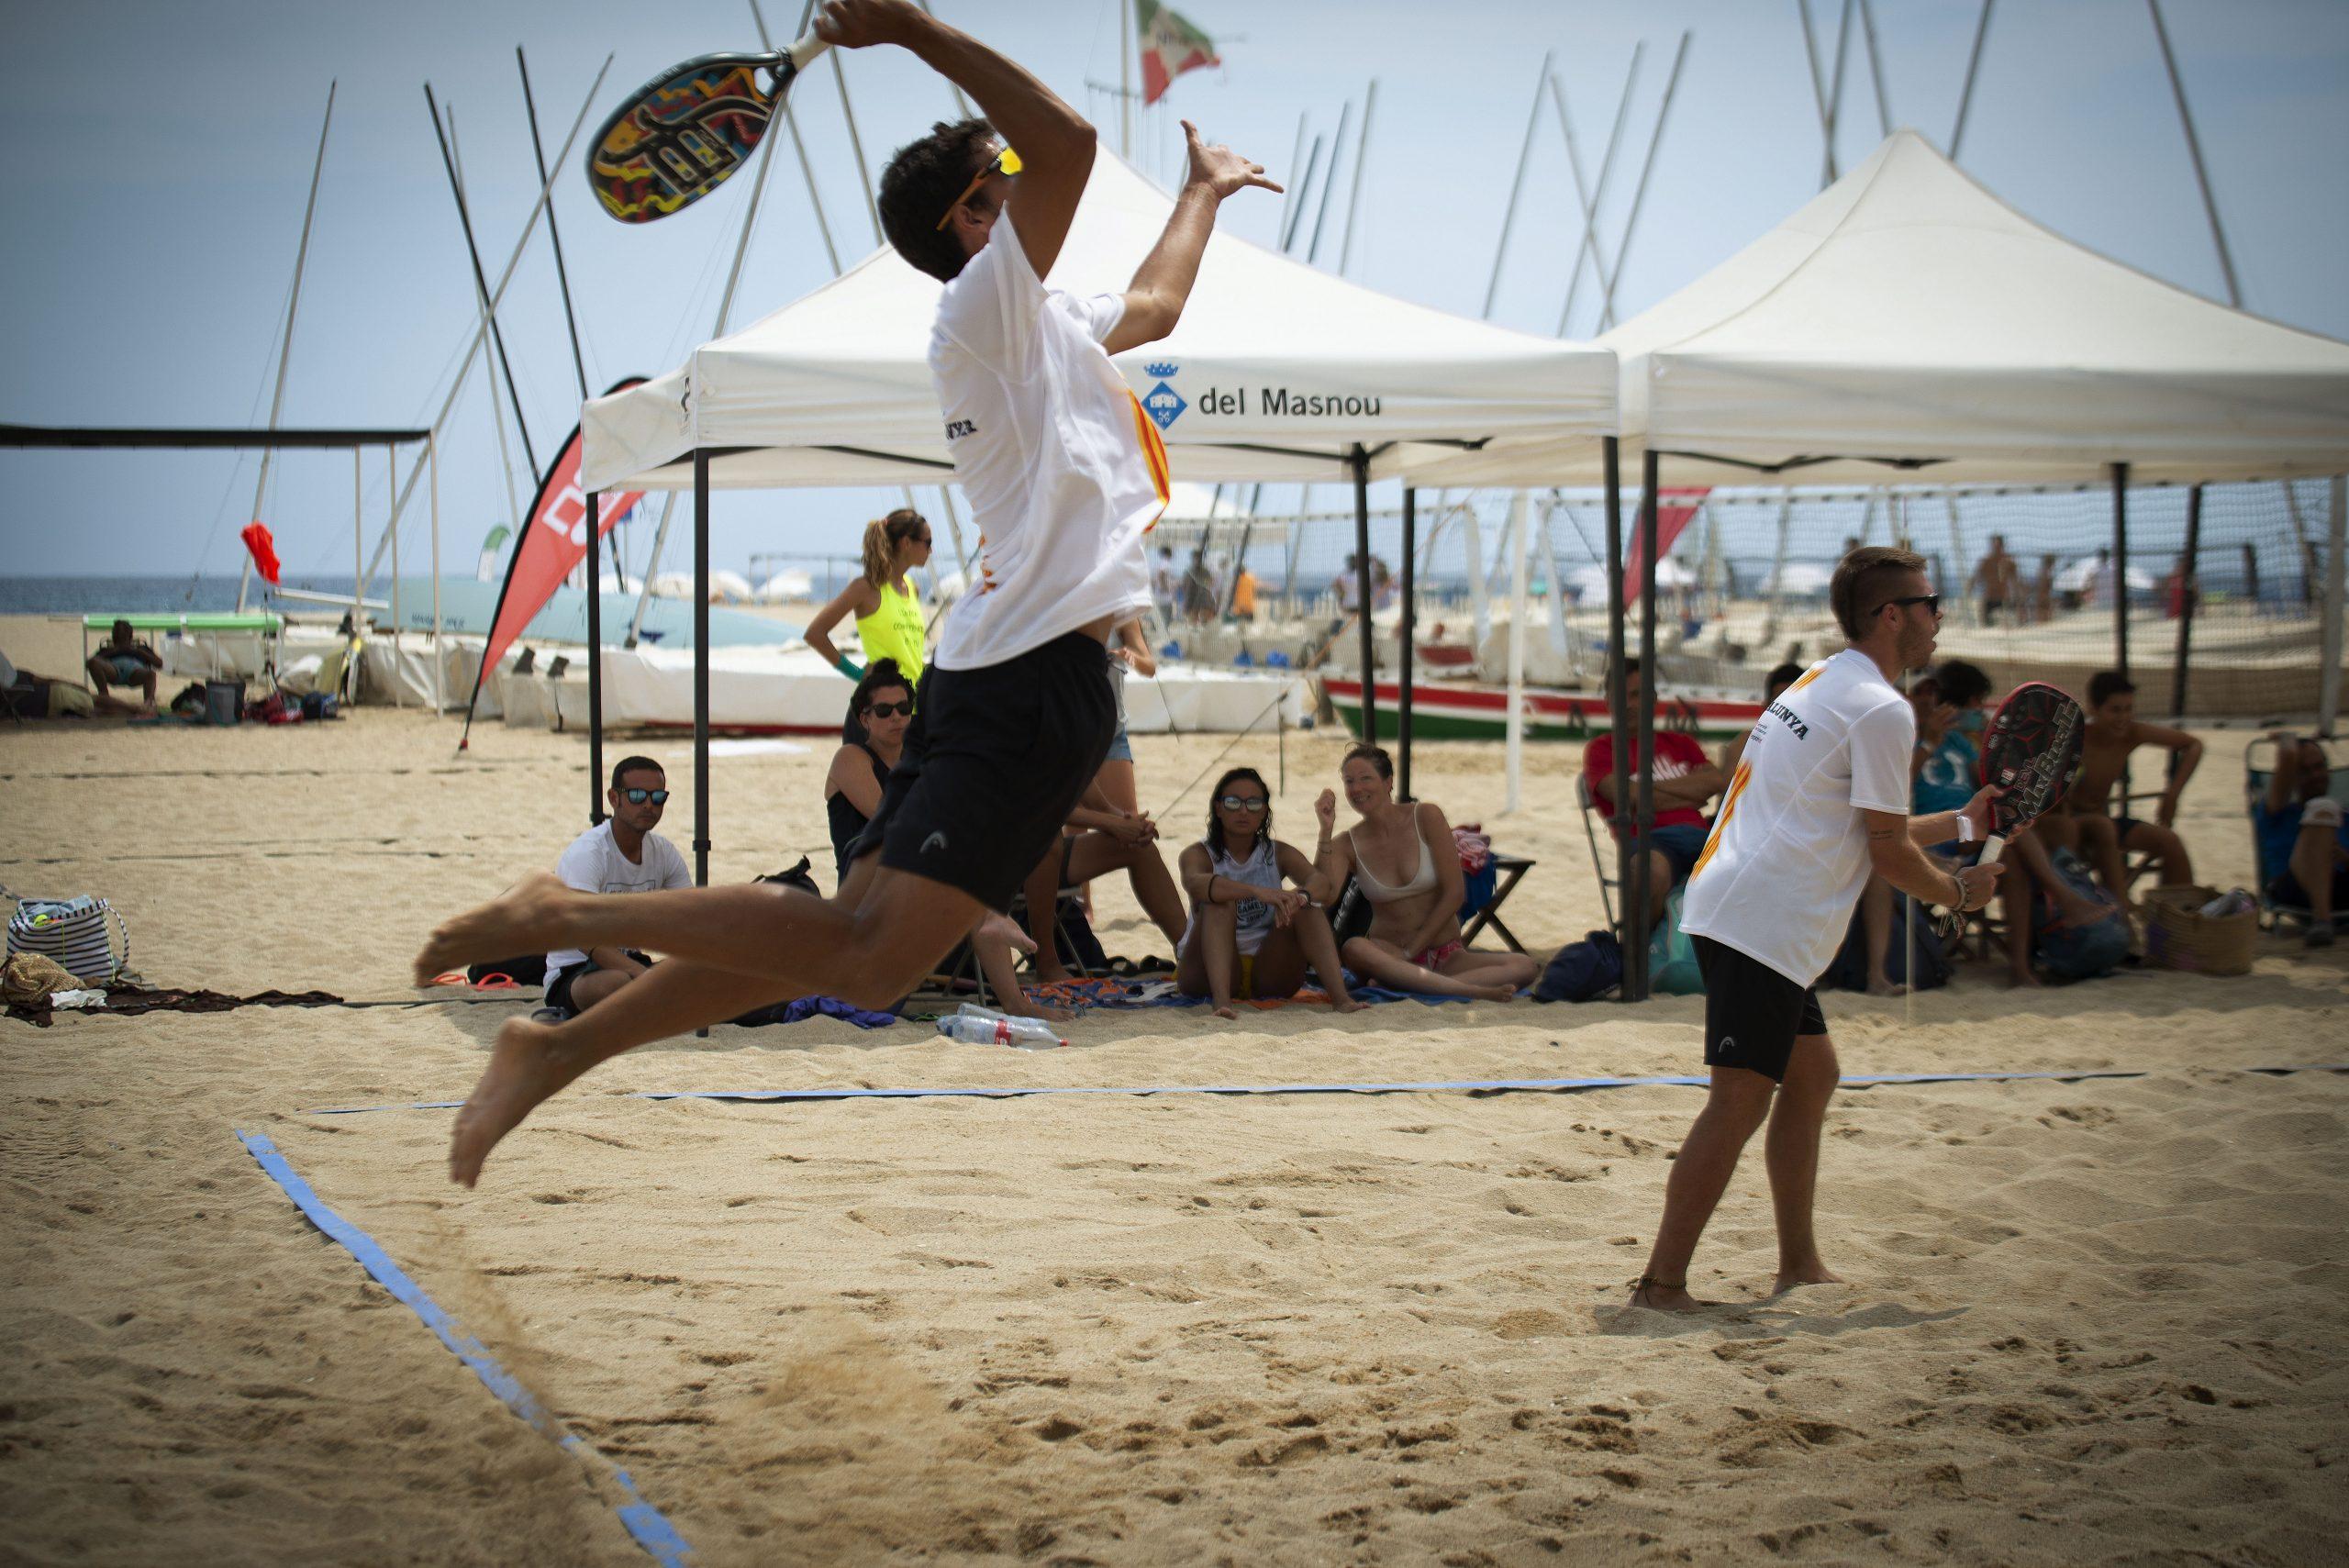 Sisena prova Lliga Mapfre de beach tennis al CNEM - 2021, beach tennis, Ganesha Diaz, Lliga Mapfre - beach tennis